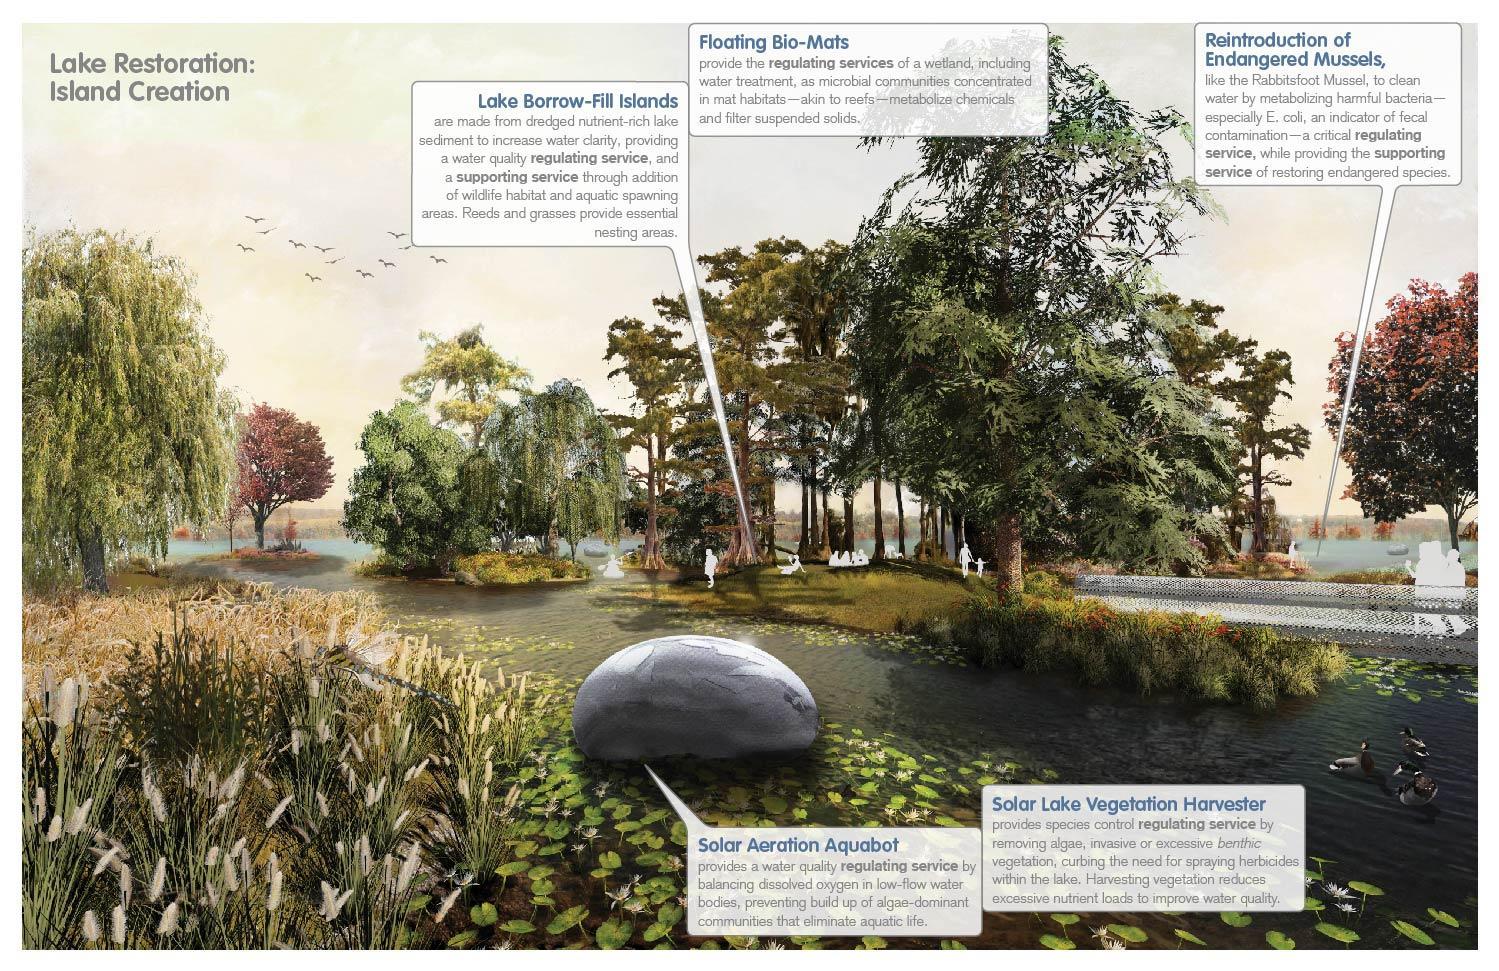 Lake restoration: island creation through floating bio-mats provides water treatment services. University of Arkansas Community Design Center